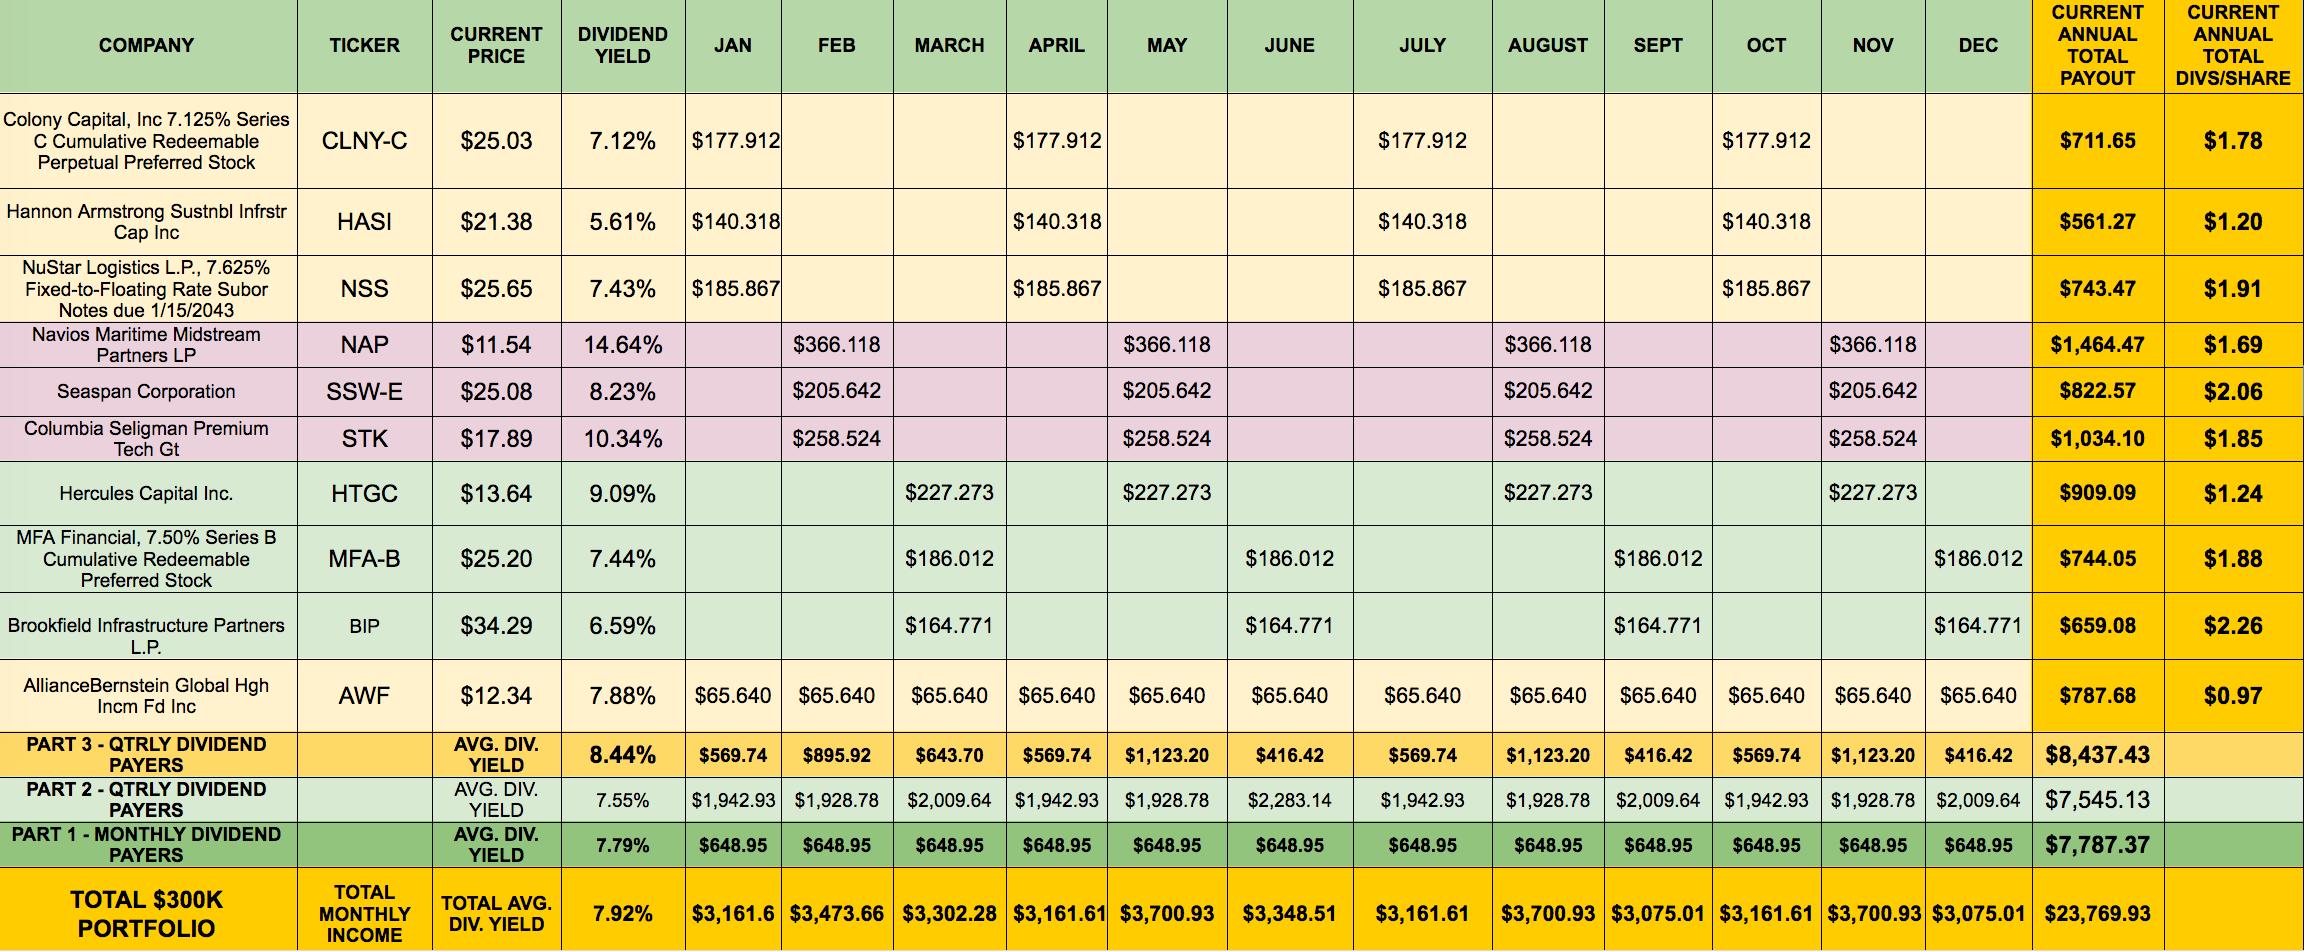 Building A Monthly High-Dividend Stock Portfolio Calendar - Part 3